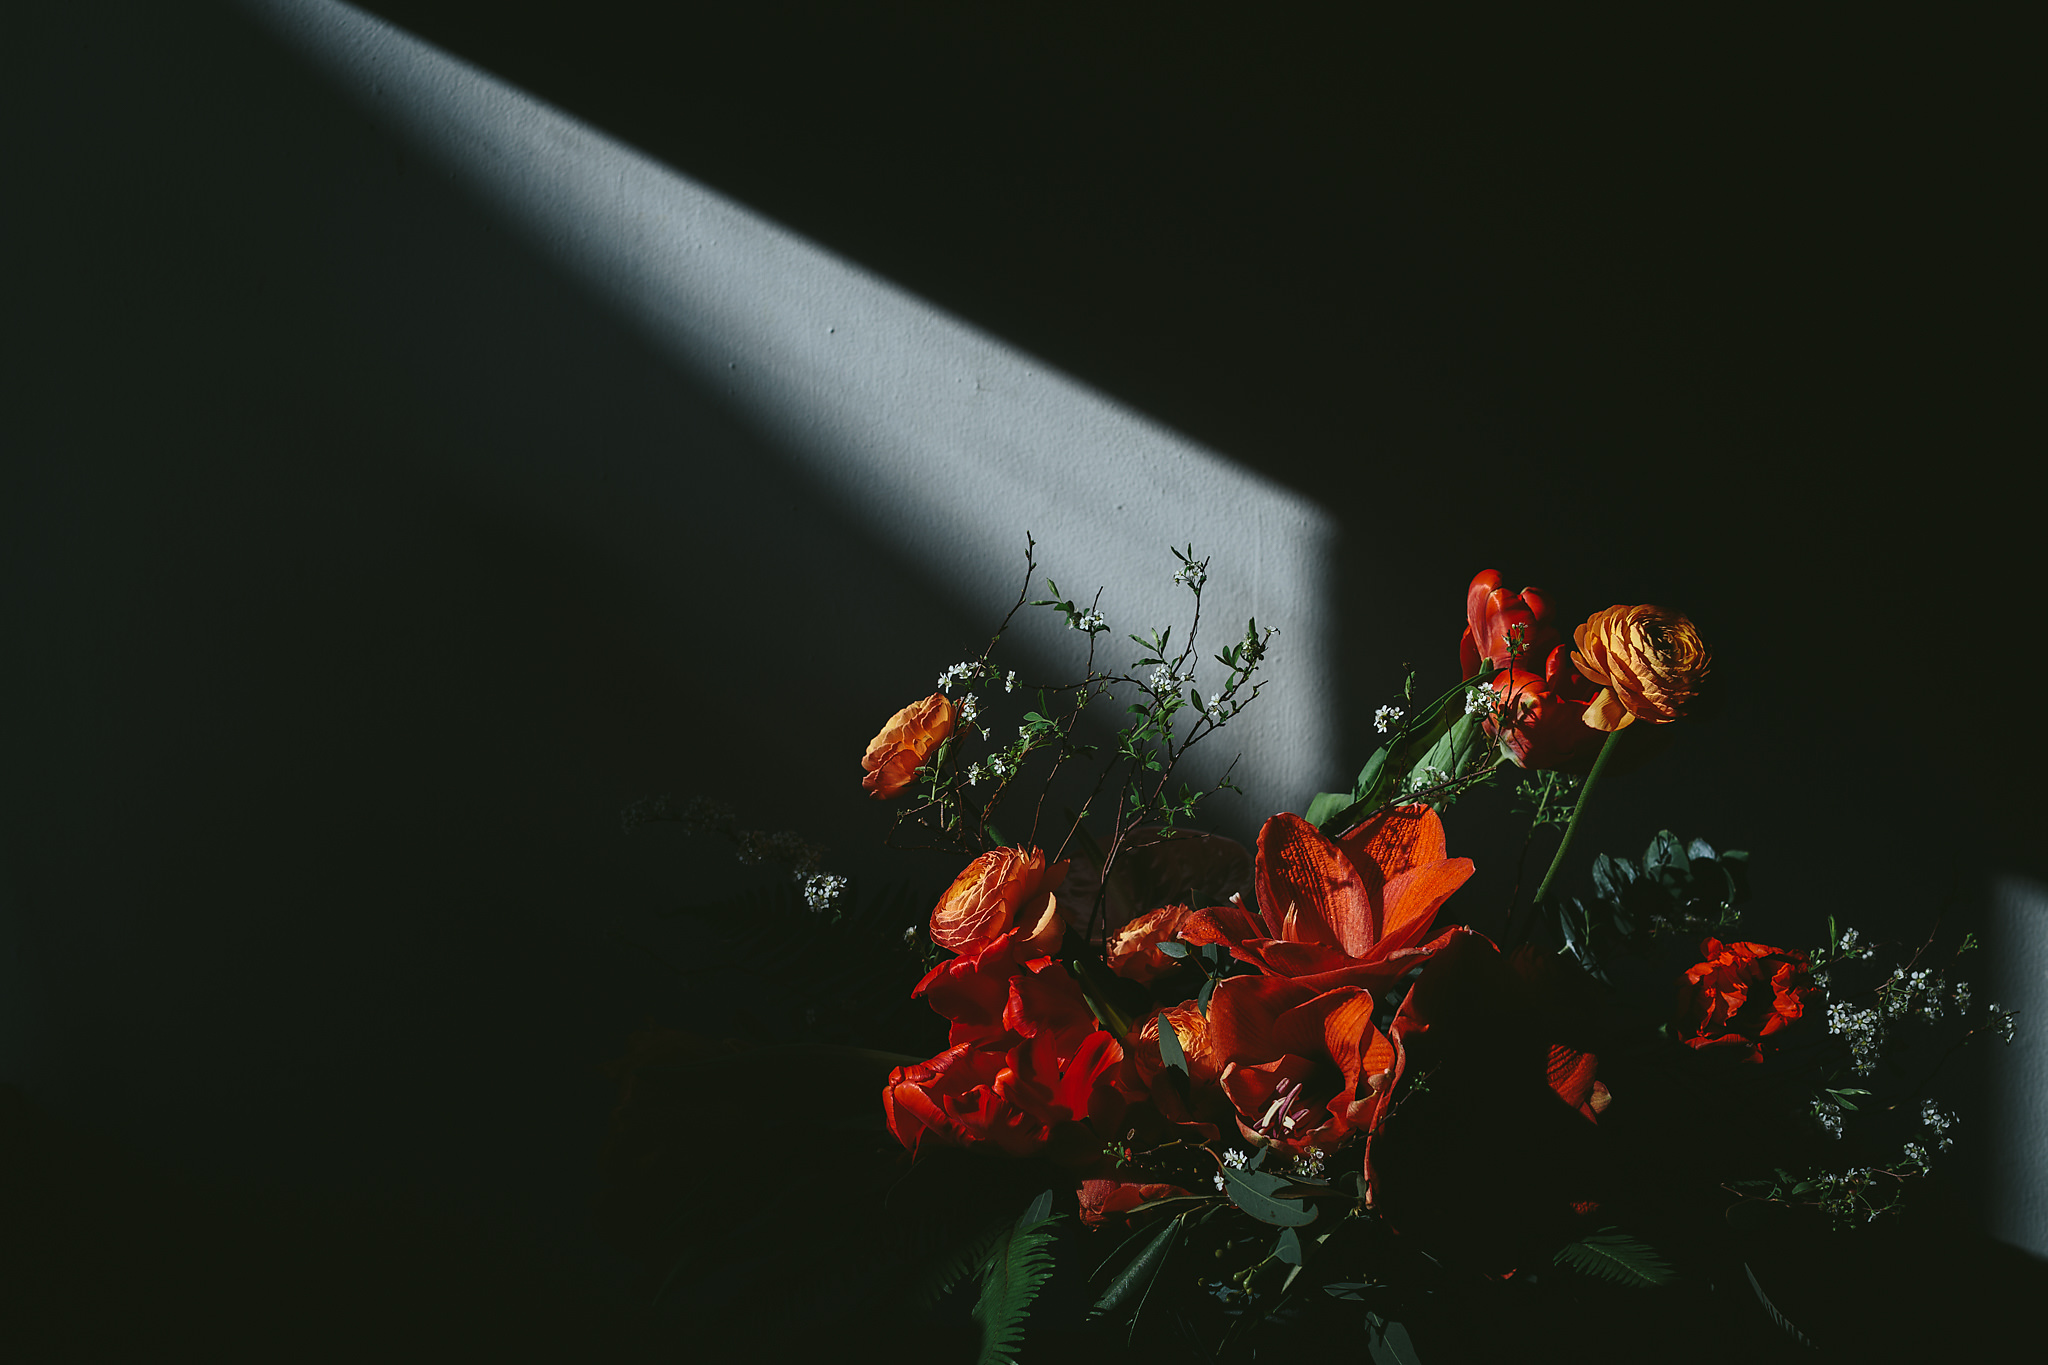 Wildflower_bouquets-1.jpg